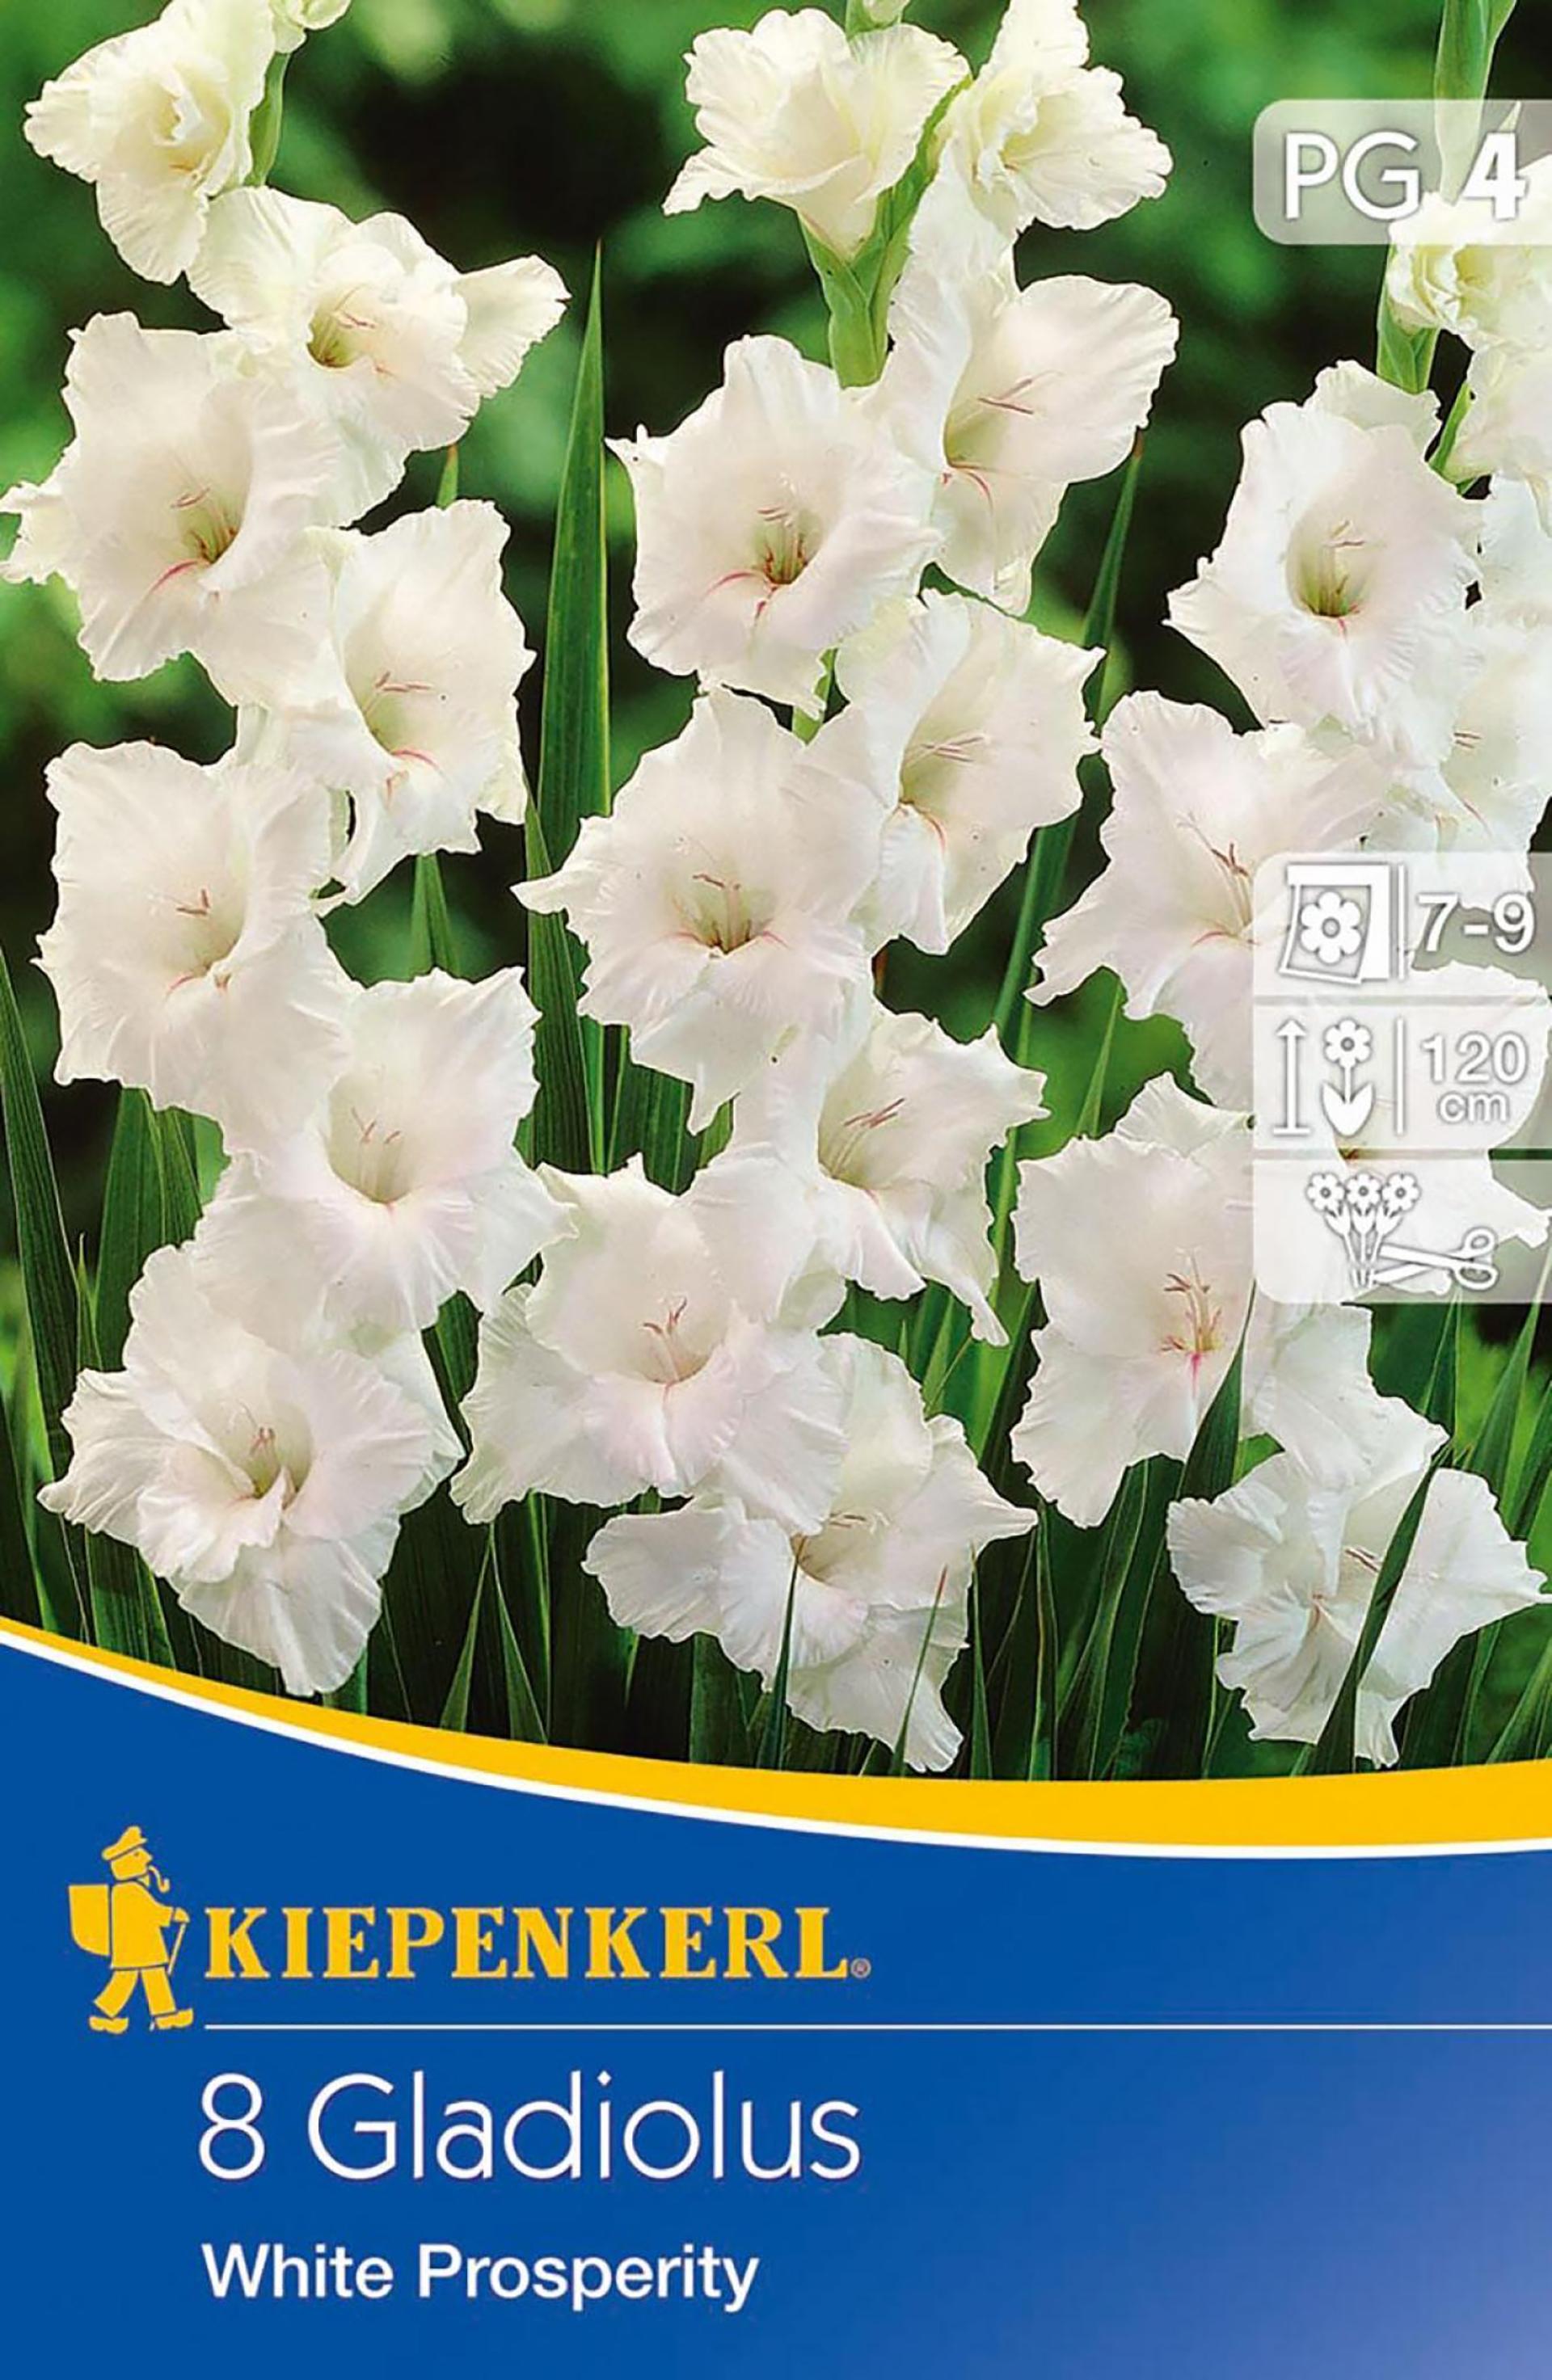 Gladiole White Prosperity  PG-4